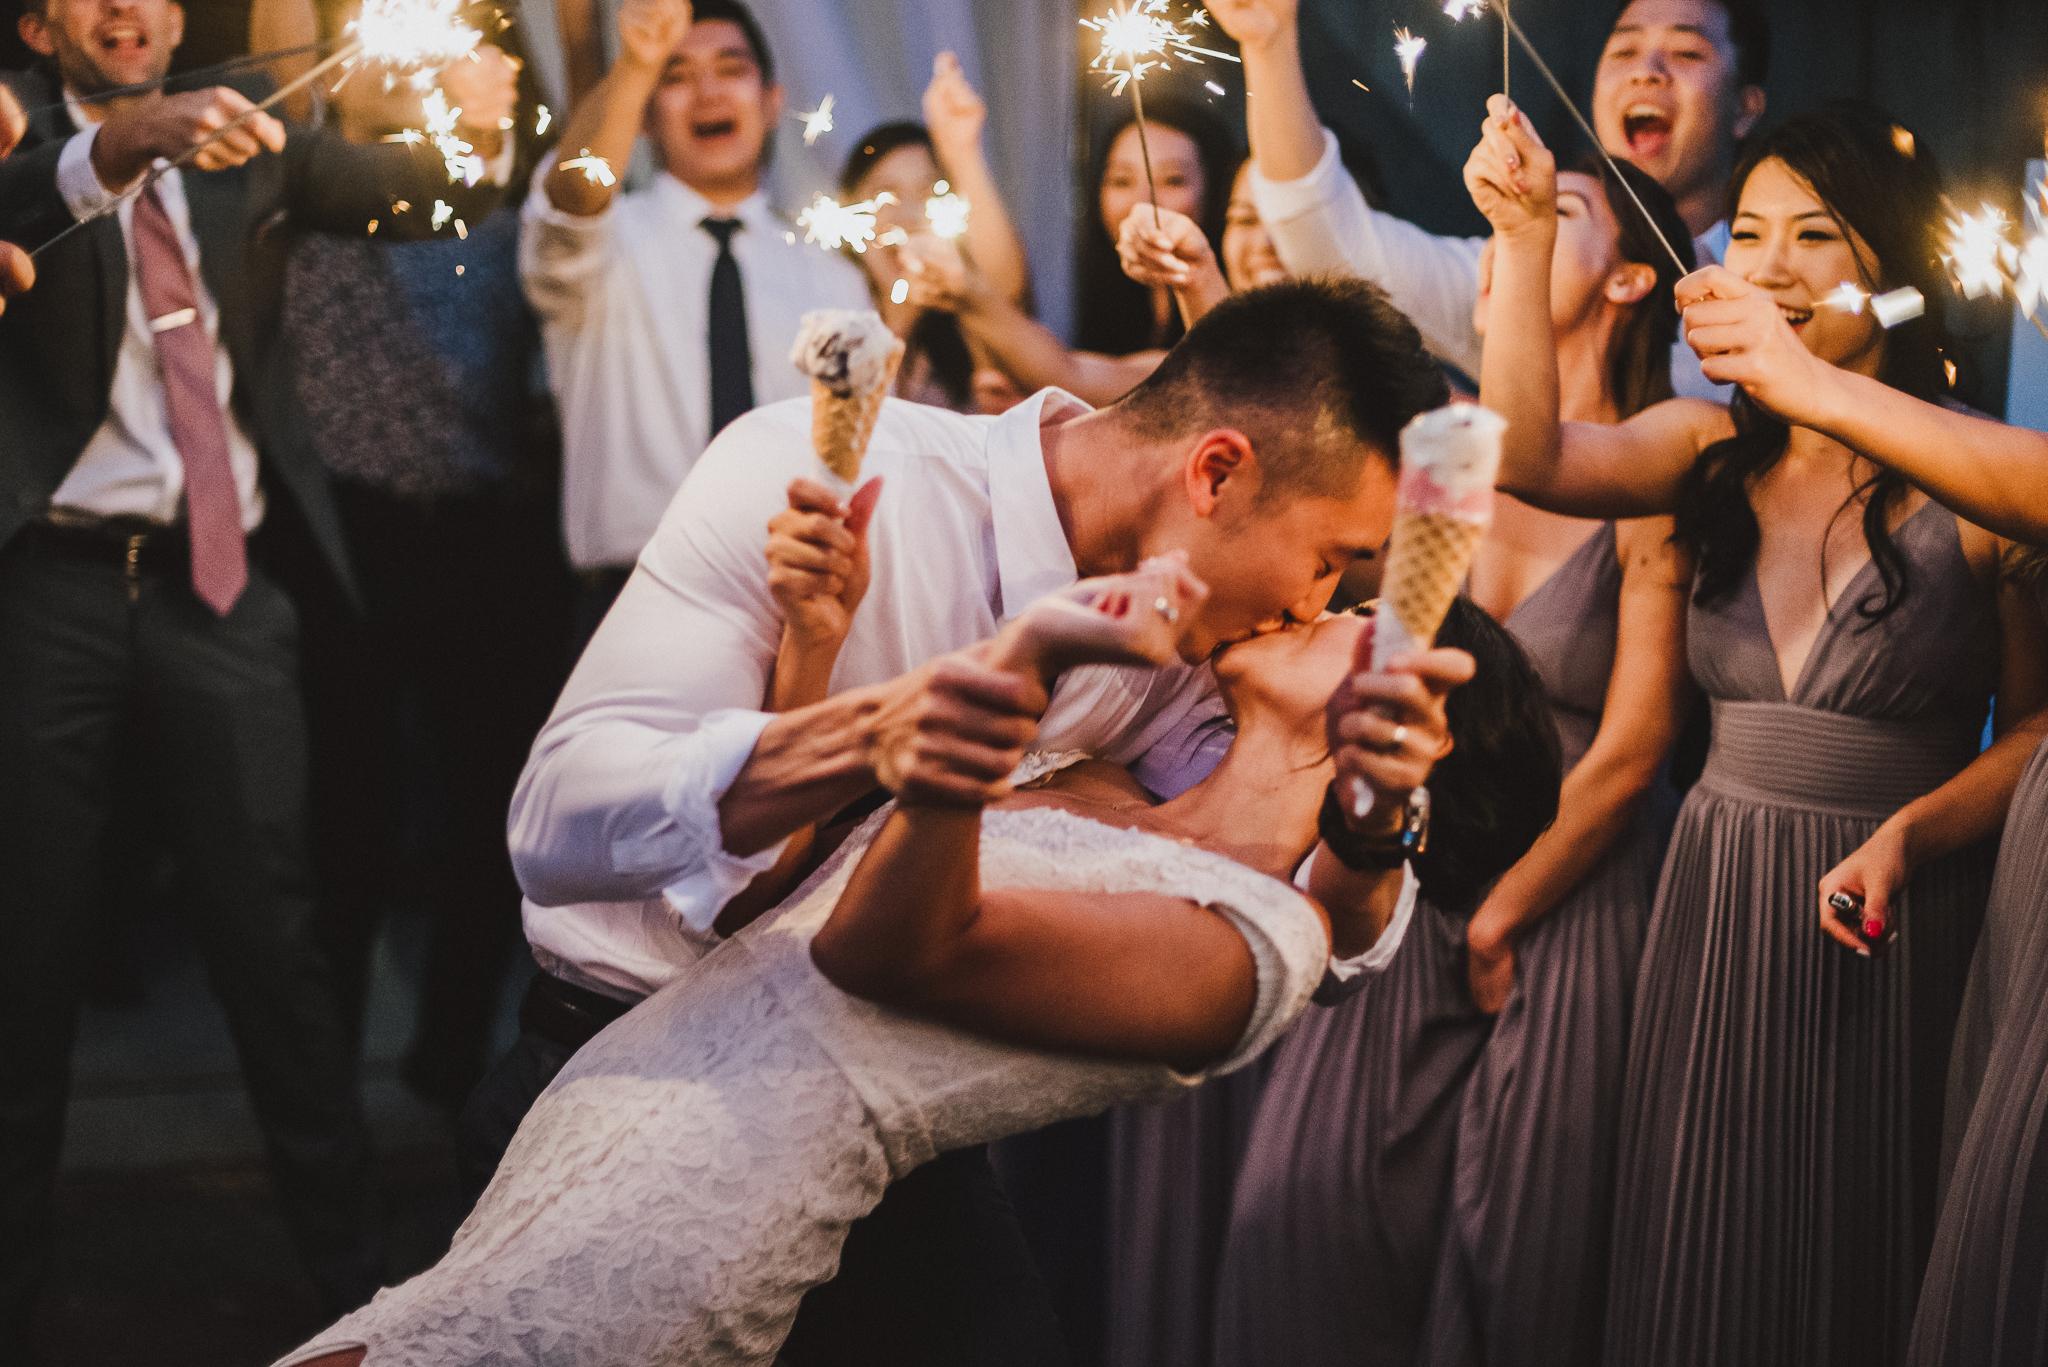 wellbrookwinerywedding-carrieaugustine-thekoebels-98.jpg